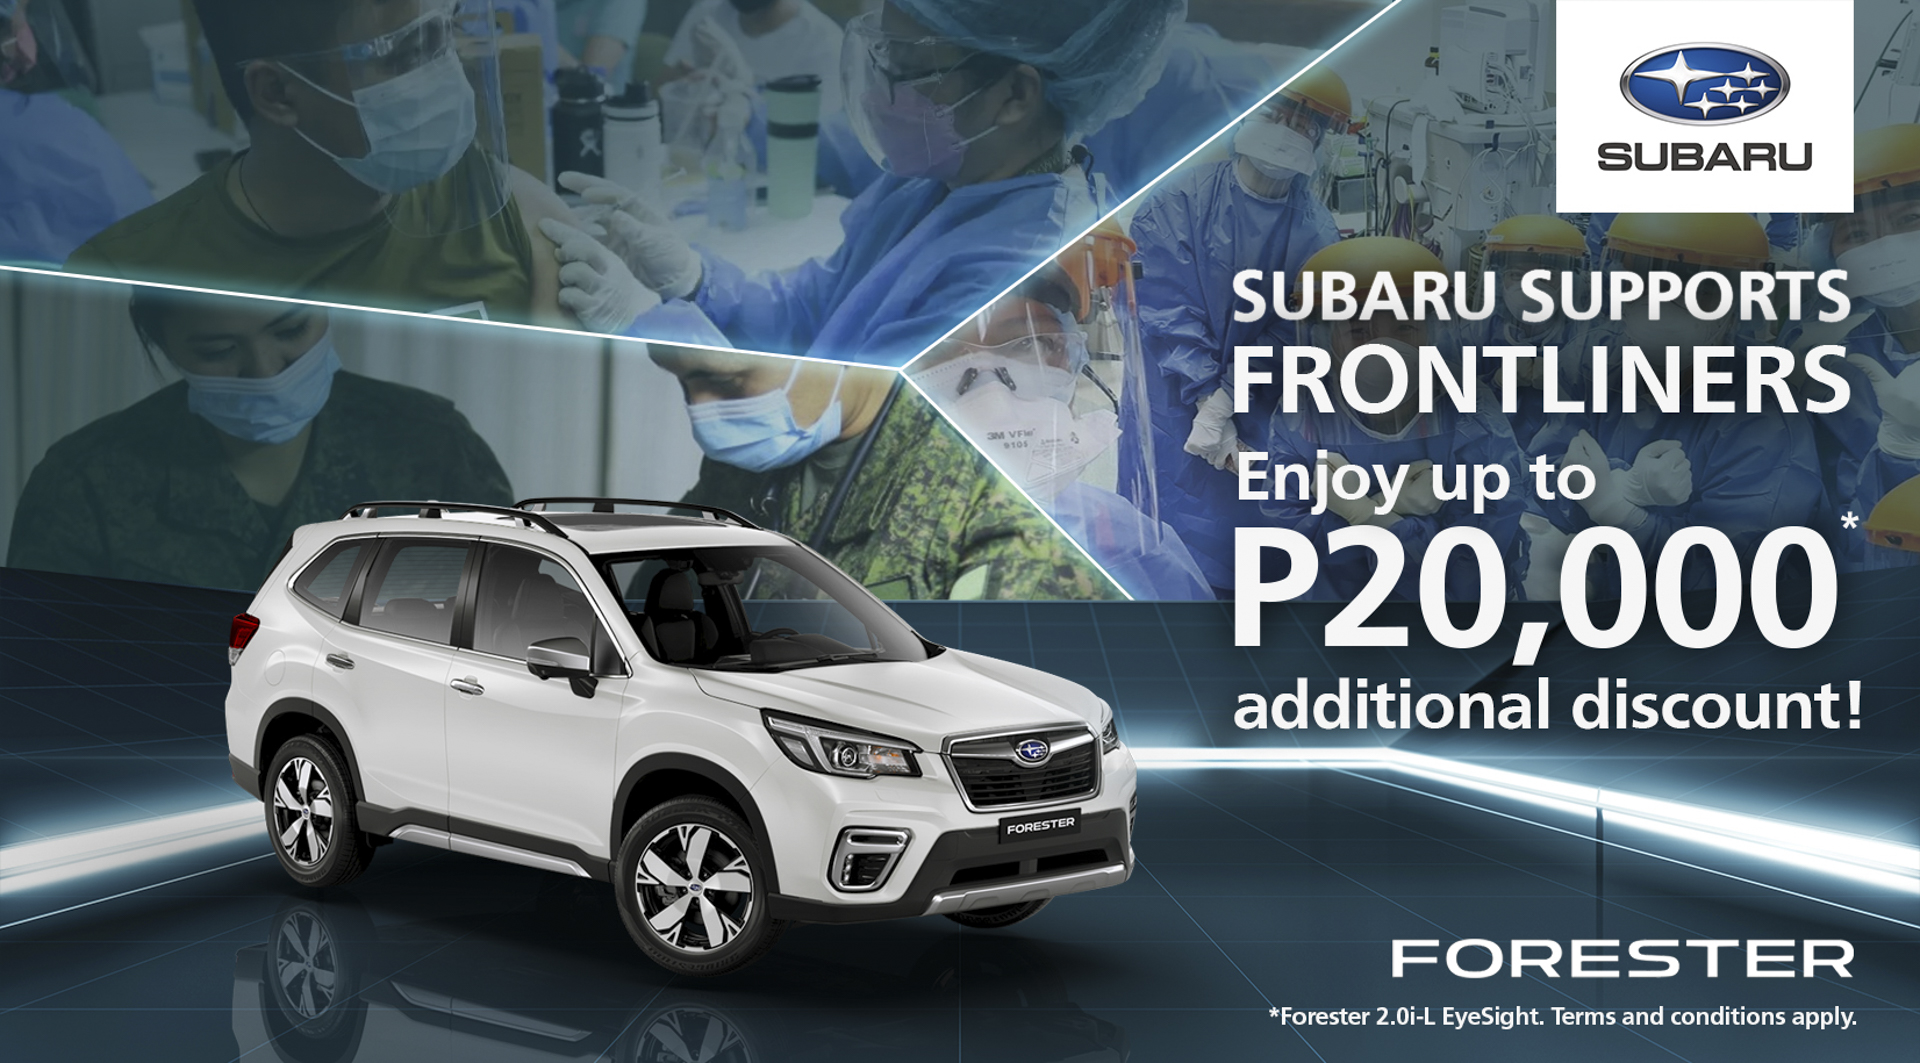 Subaru launches Special Frontliners Appreciation promo this July